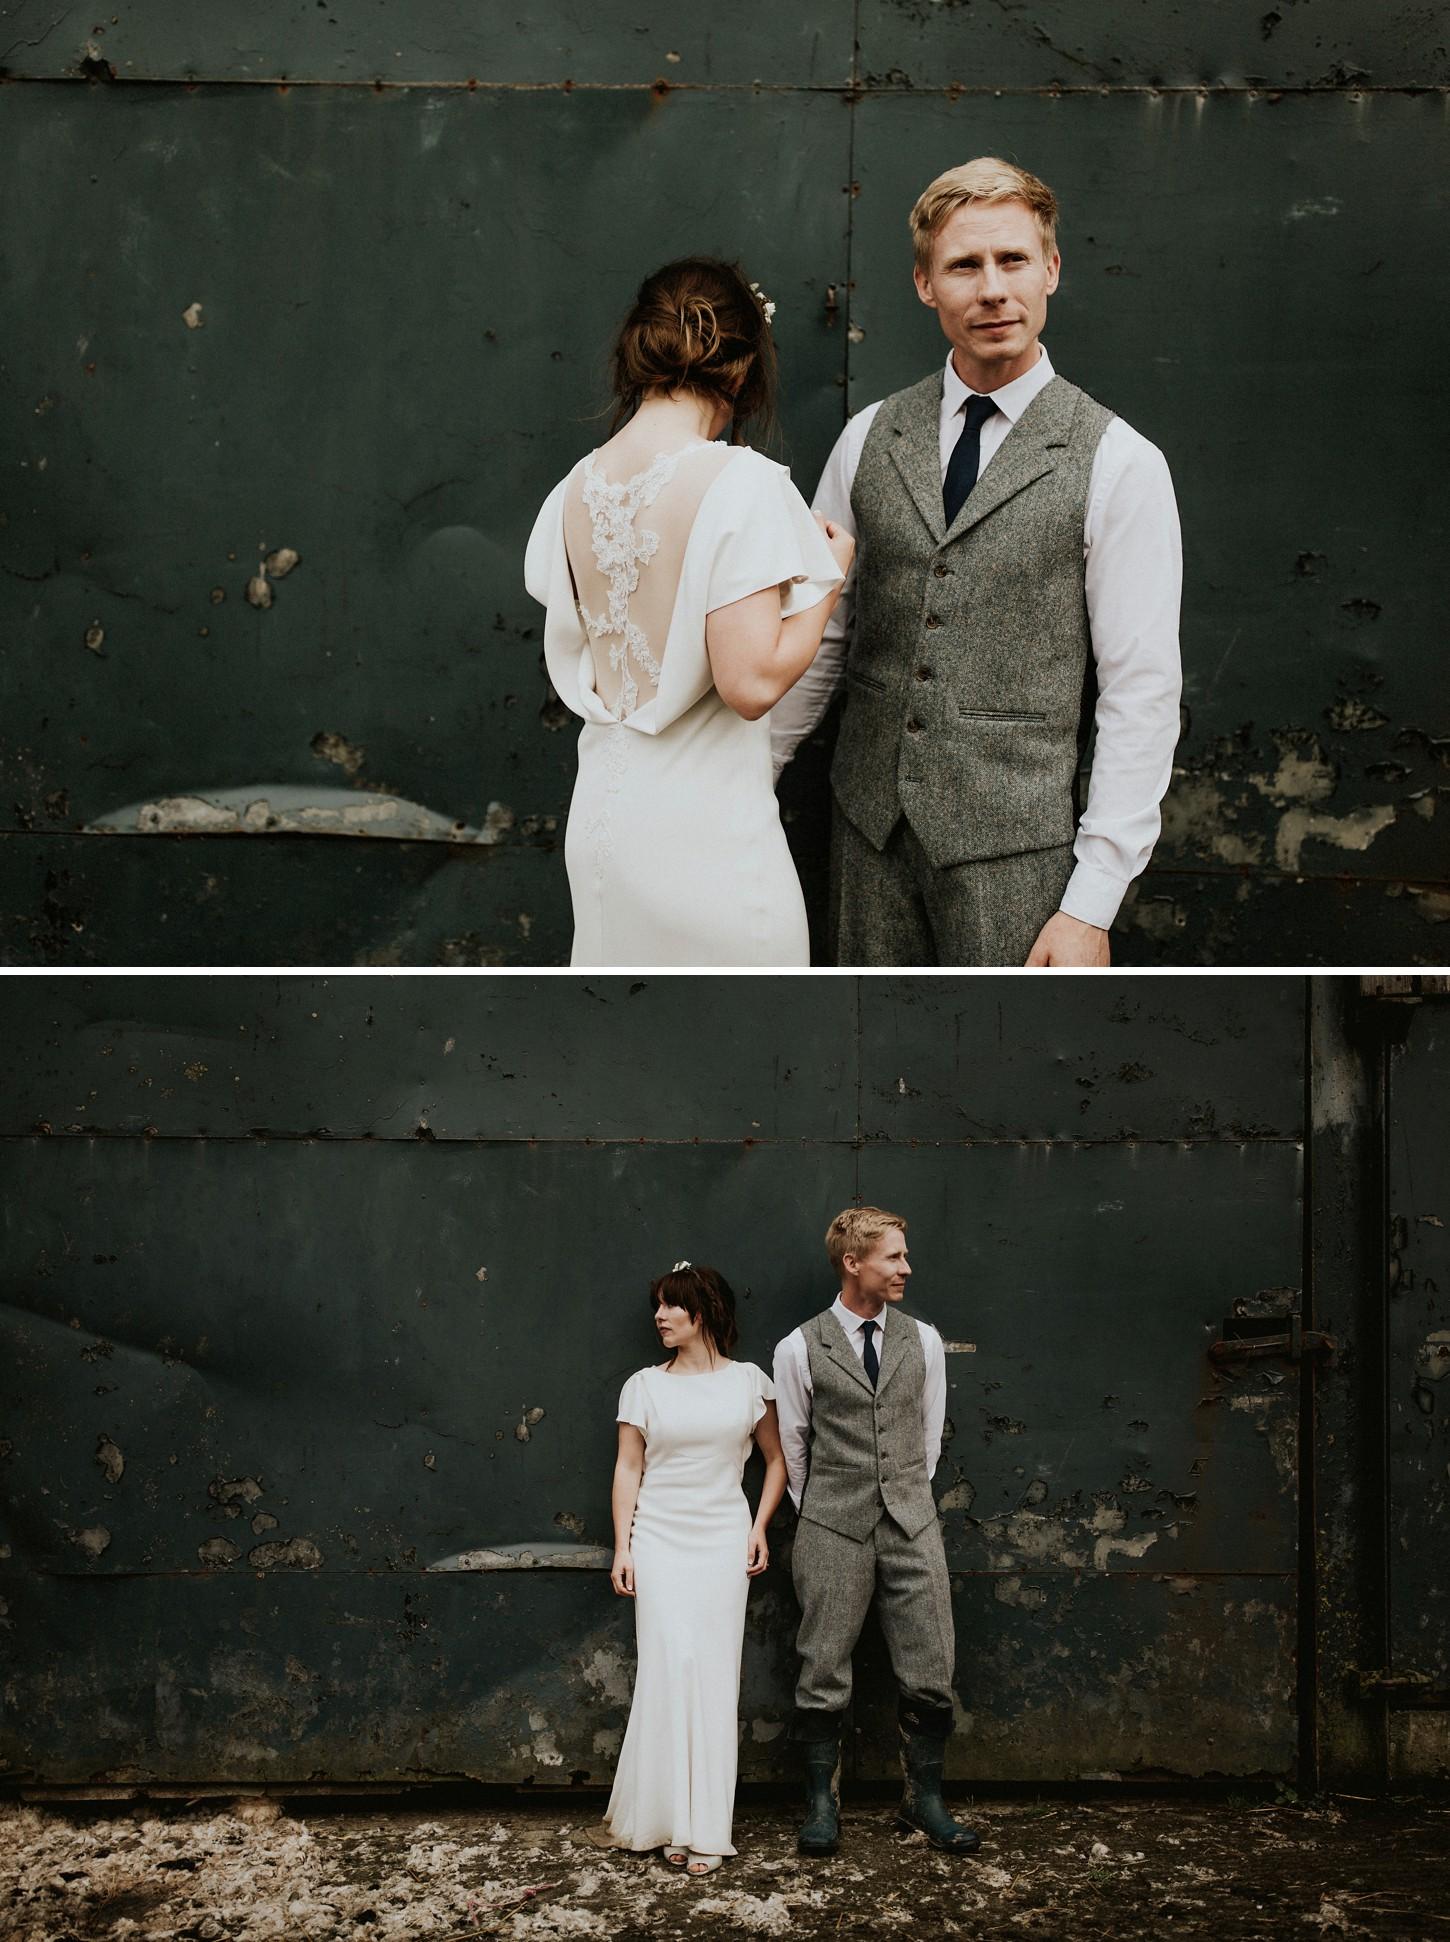 Dolau-Sheep-Farm-Wedding-Wales-United-Kingdom-061